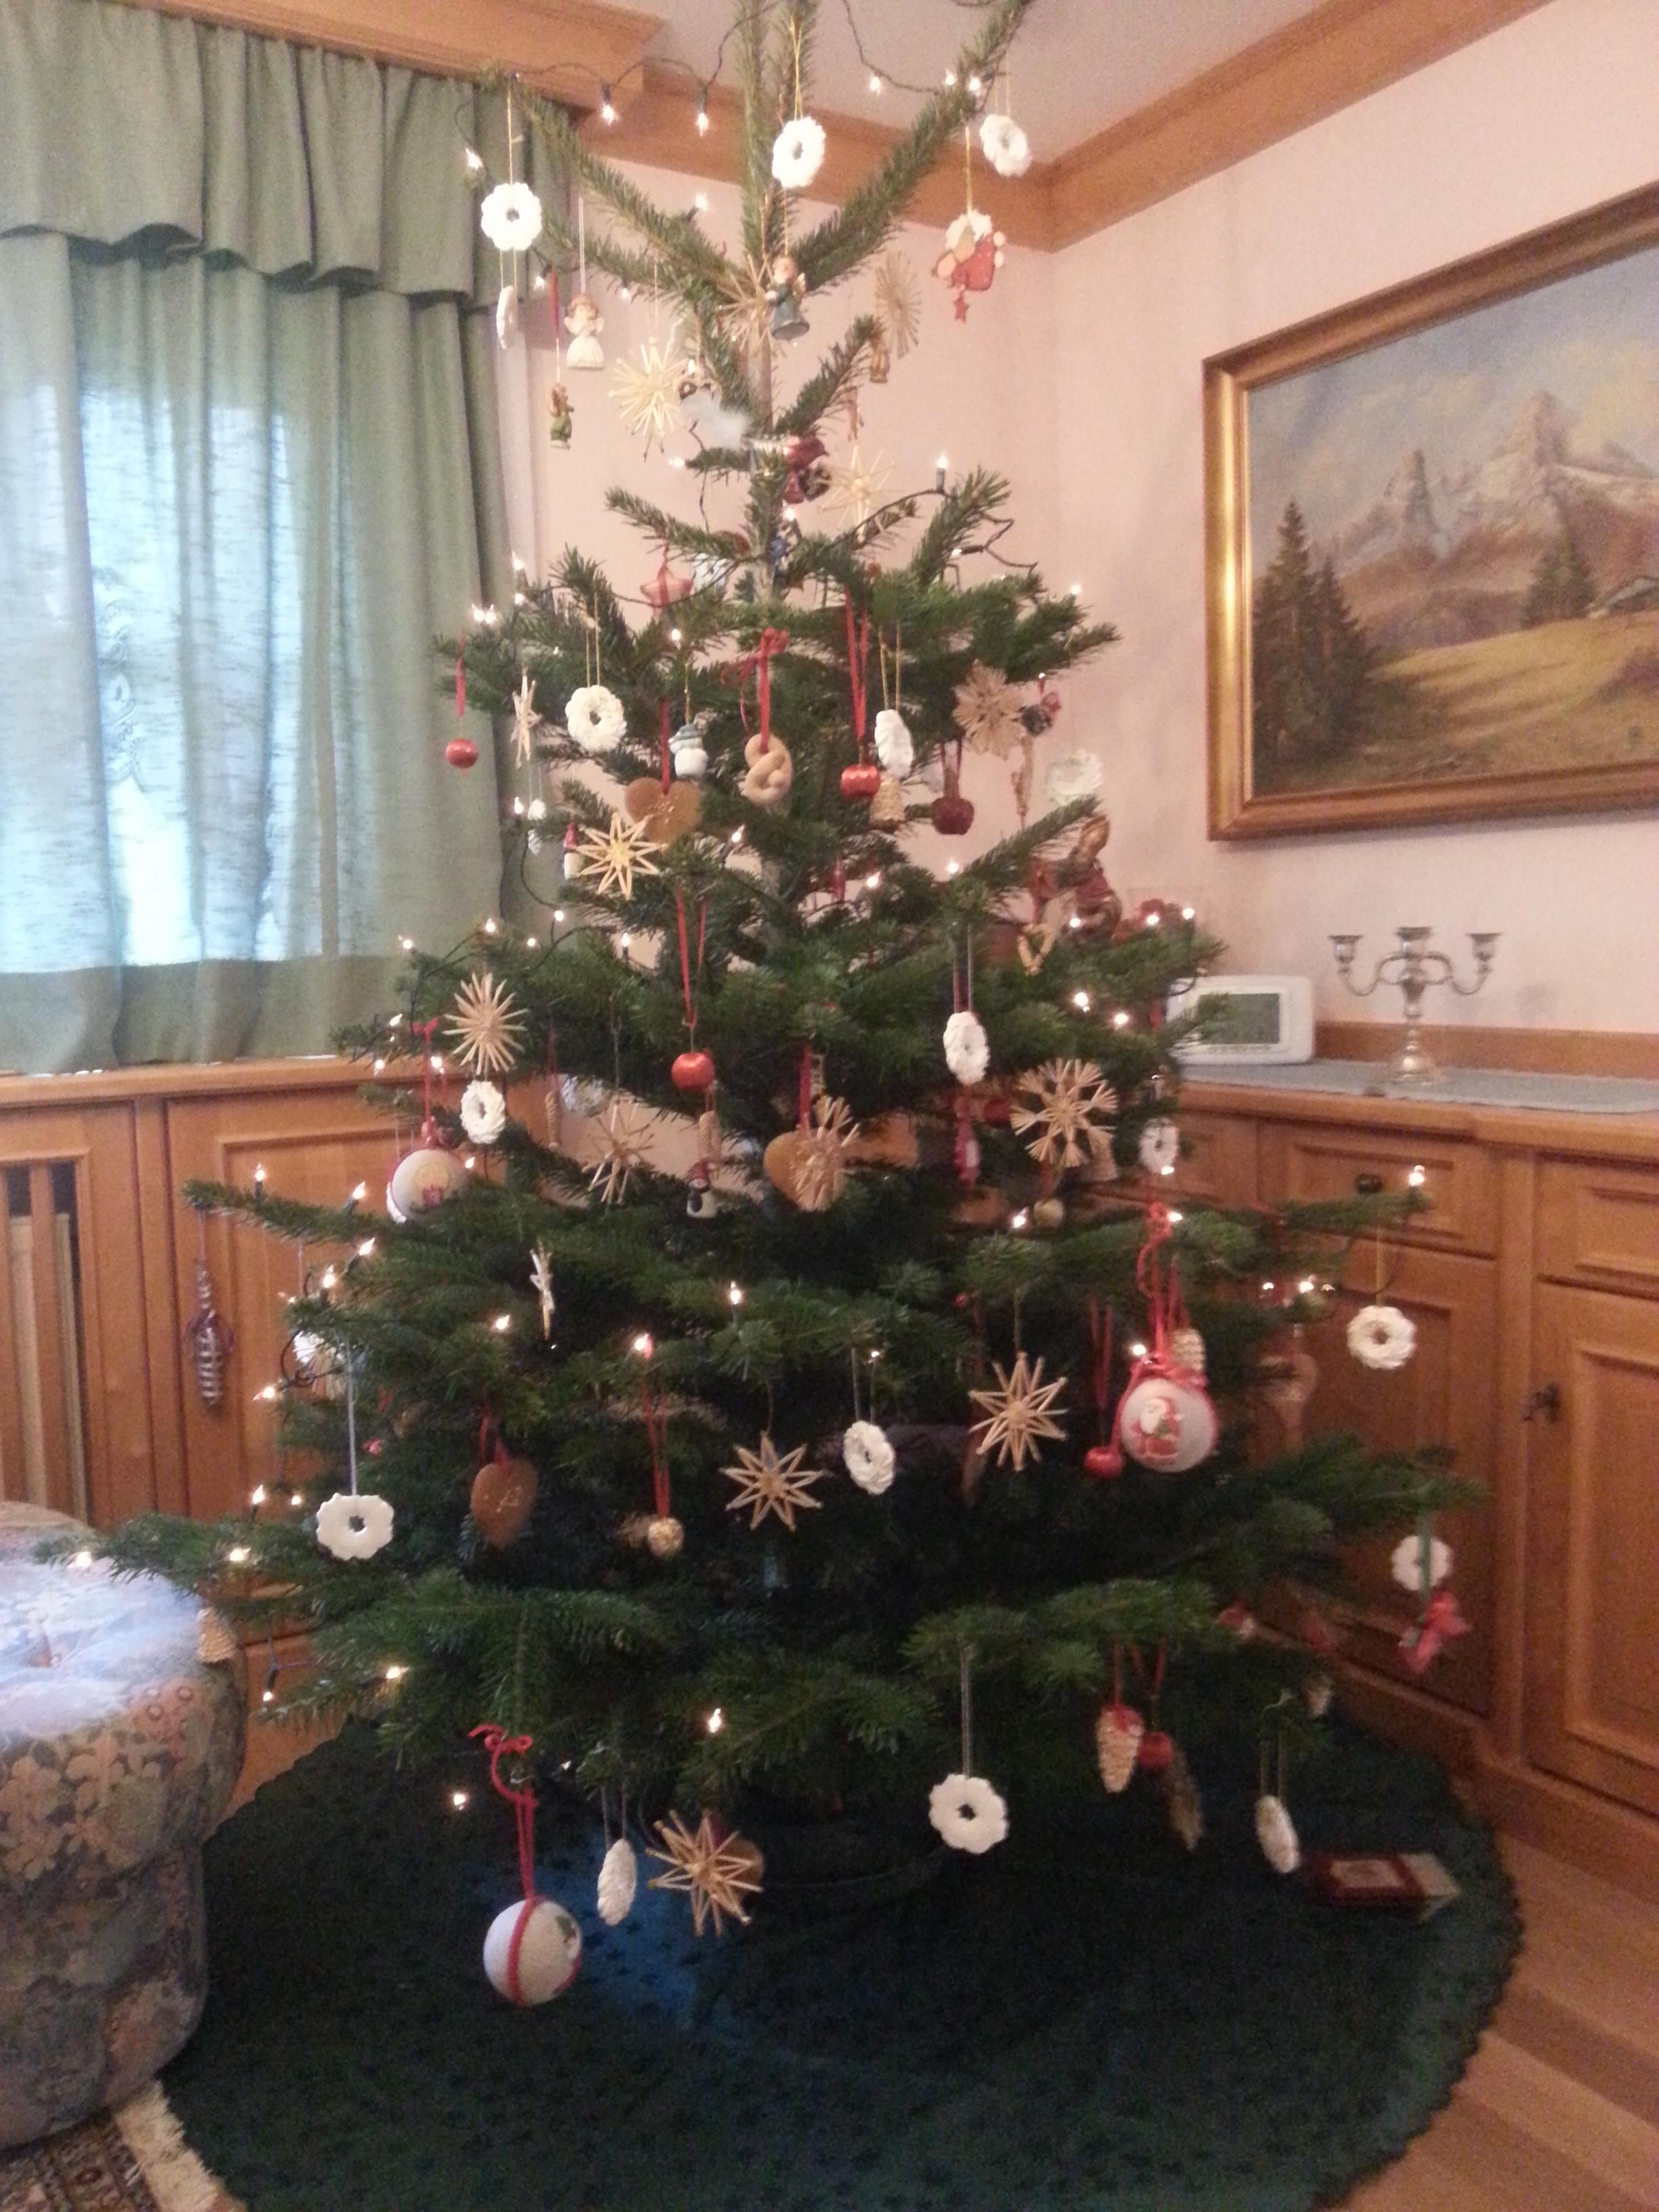 wp_20161224_027jpg2448x3264 268 mb - Christmas Forum